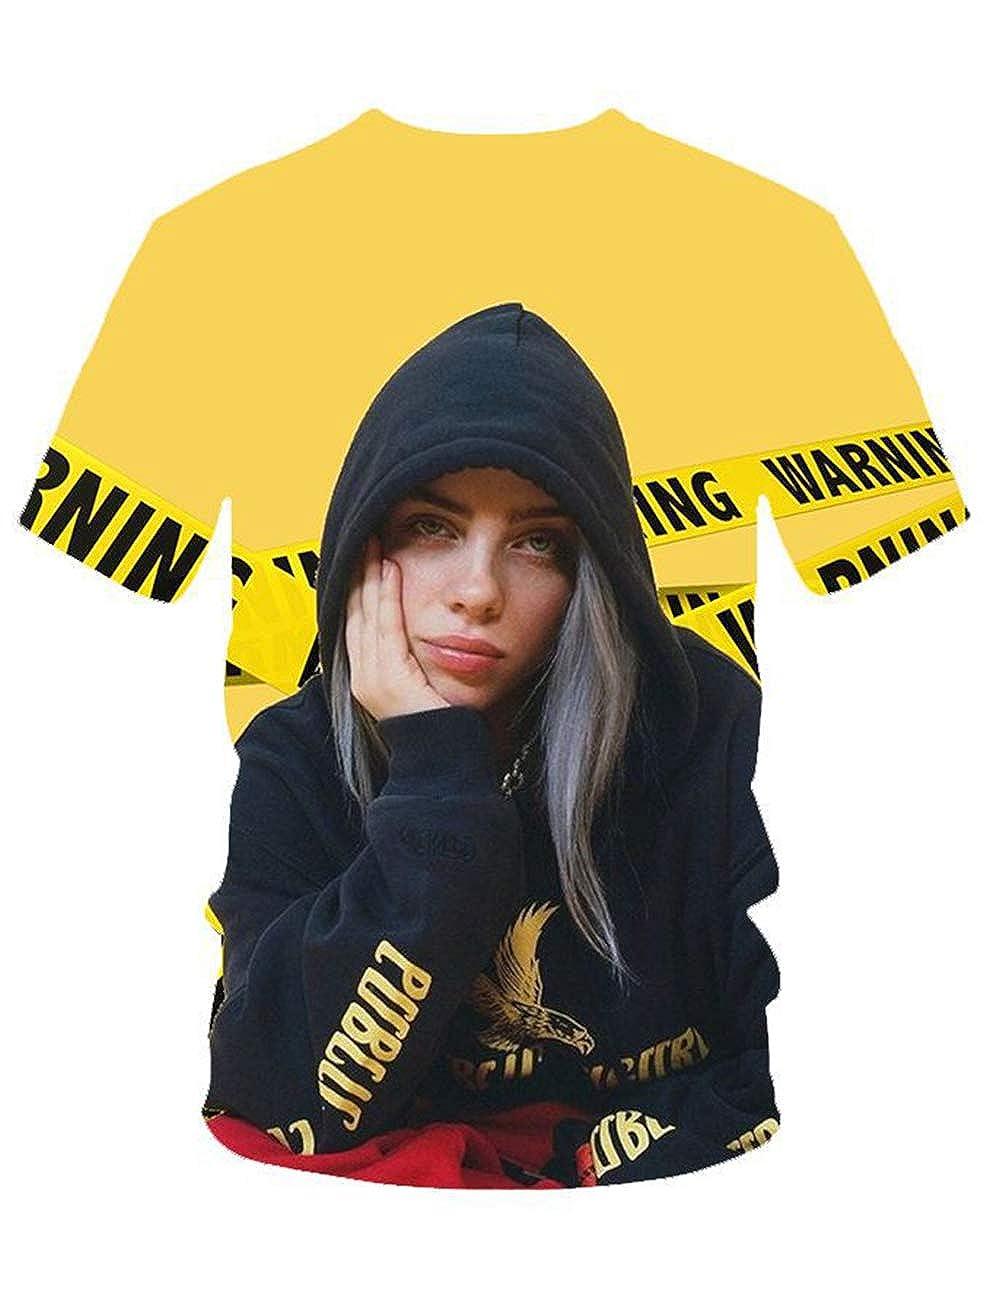 Moda Trend Singer per Billie Eilish Maglietta Bury a Friend Hip Pop T-Shirt Camicetta Top Bluse Maniche Corte per Uomo Donna Teen